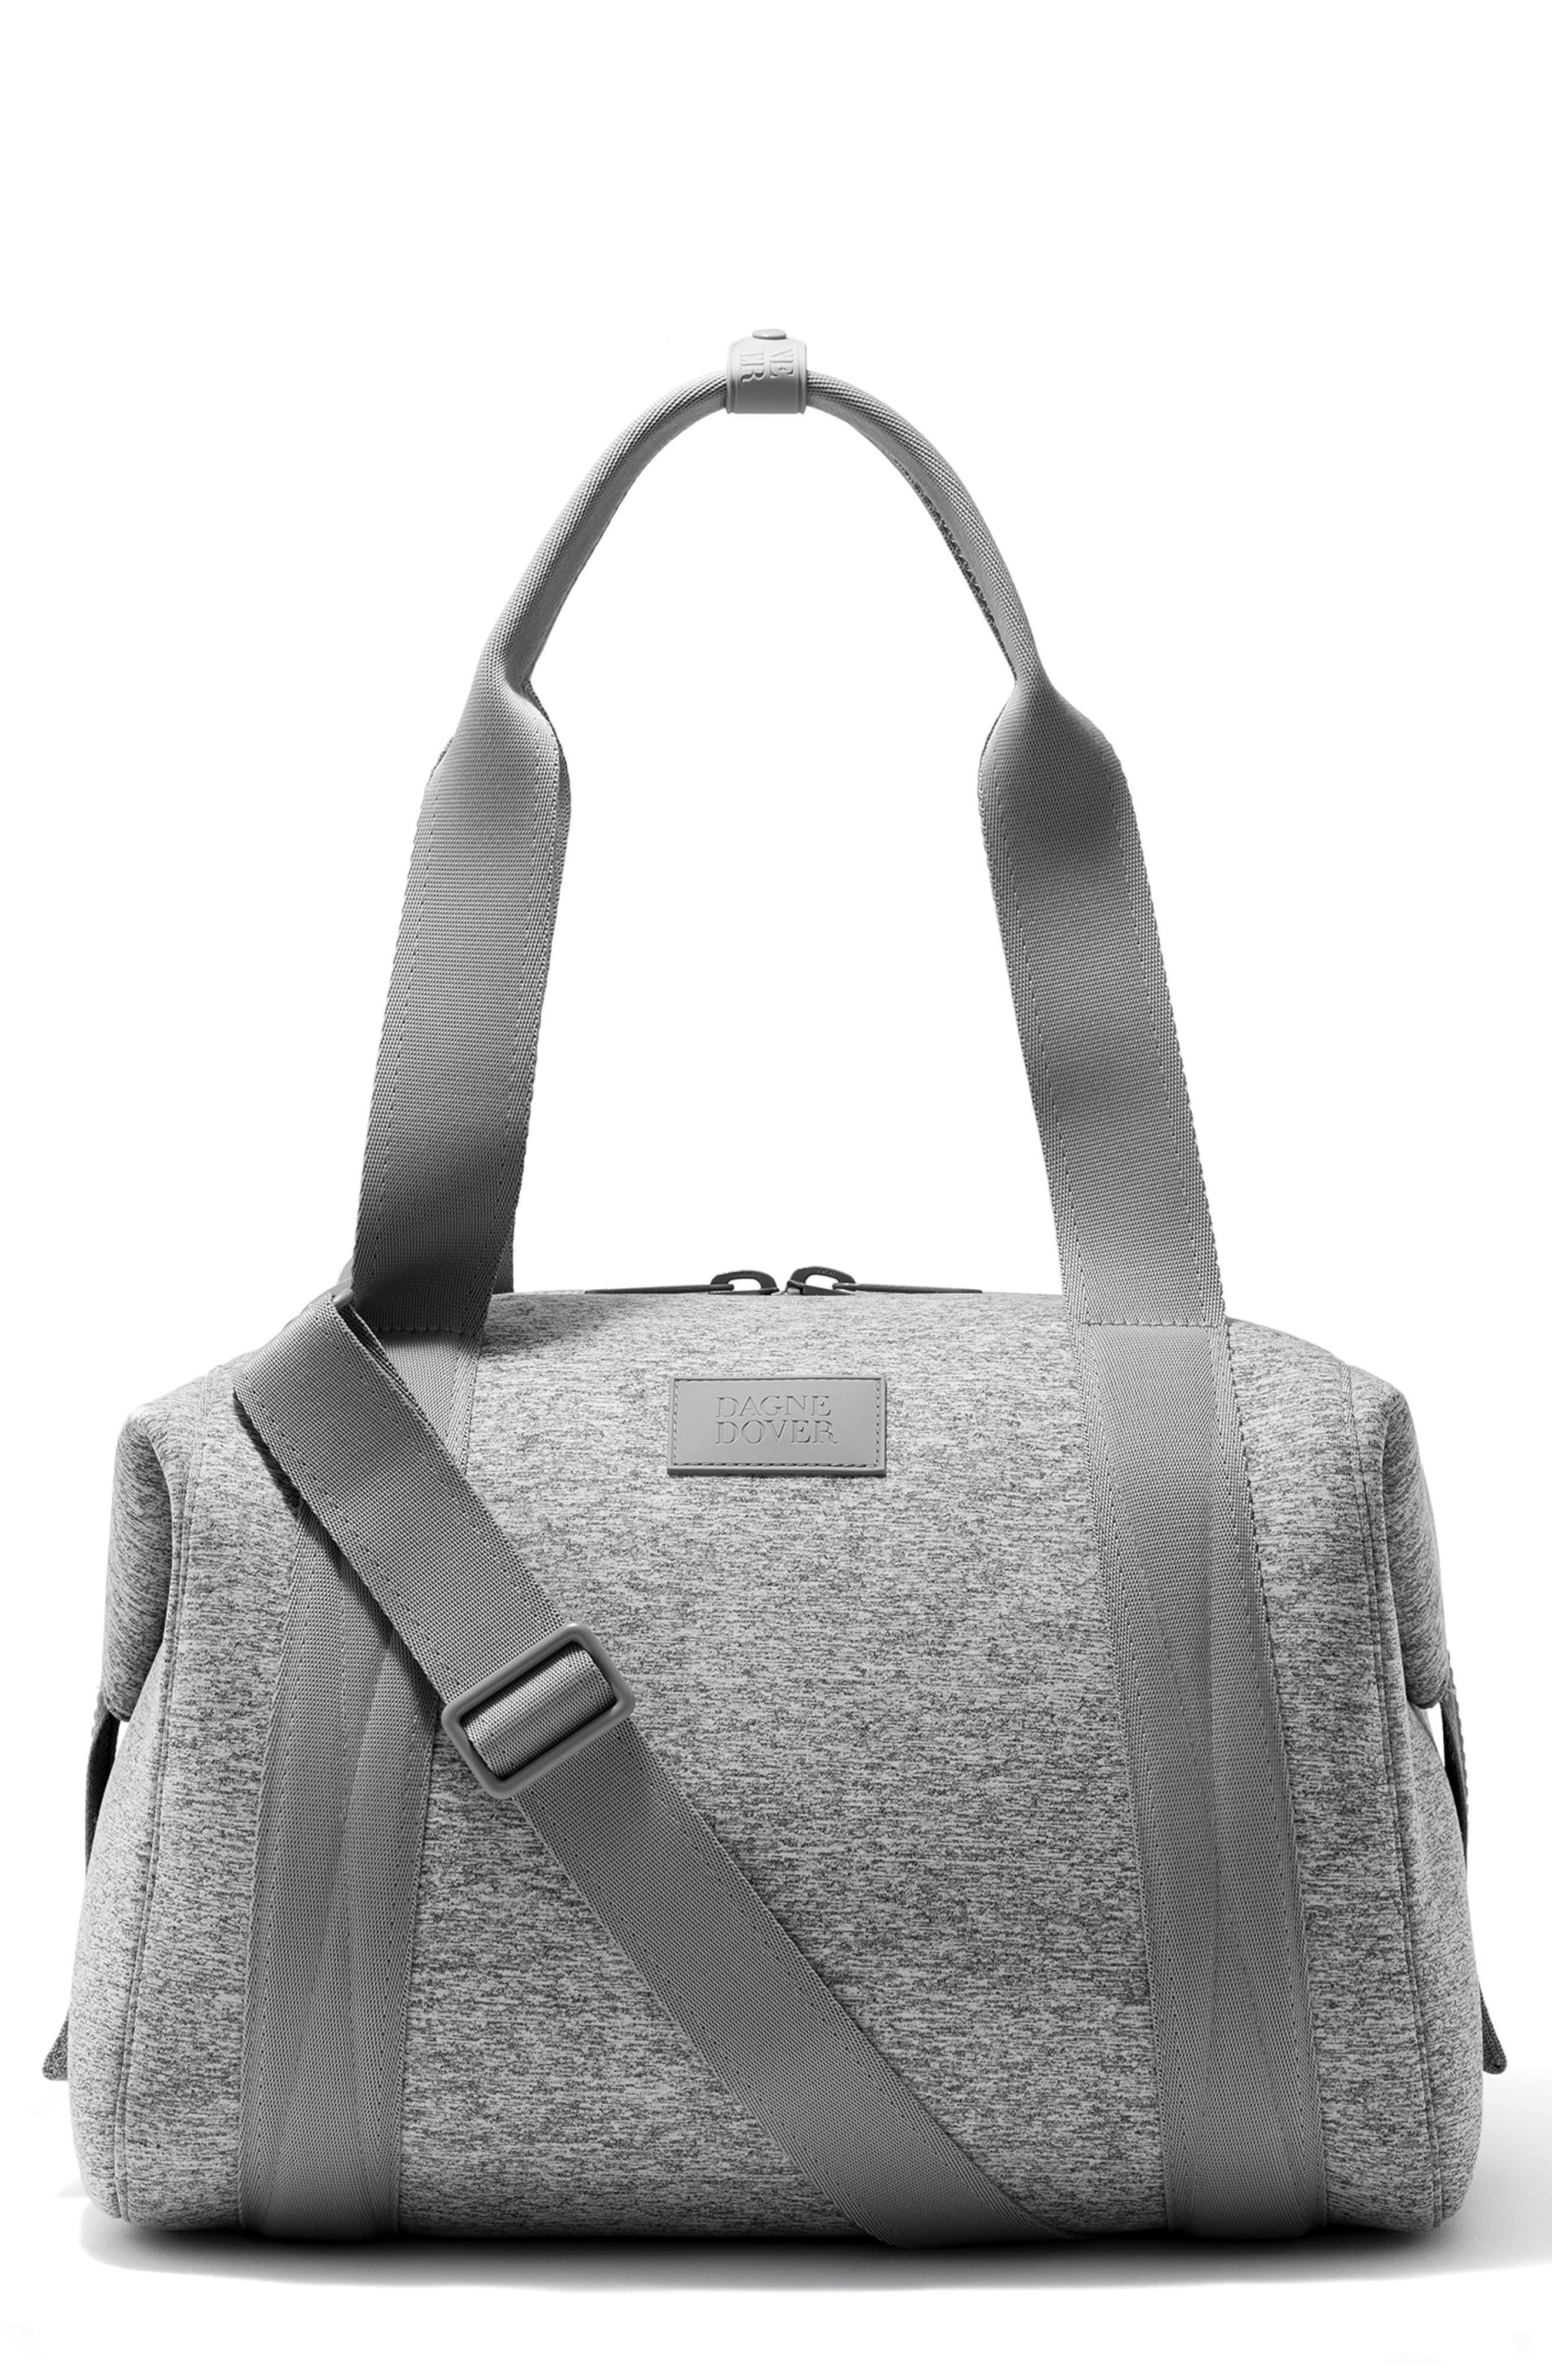 365 Medium Landon Neoprene Carryall Duffle Bag, Main, color, HEATHER GREY